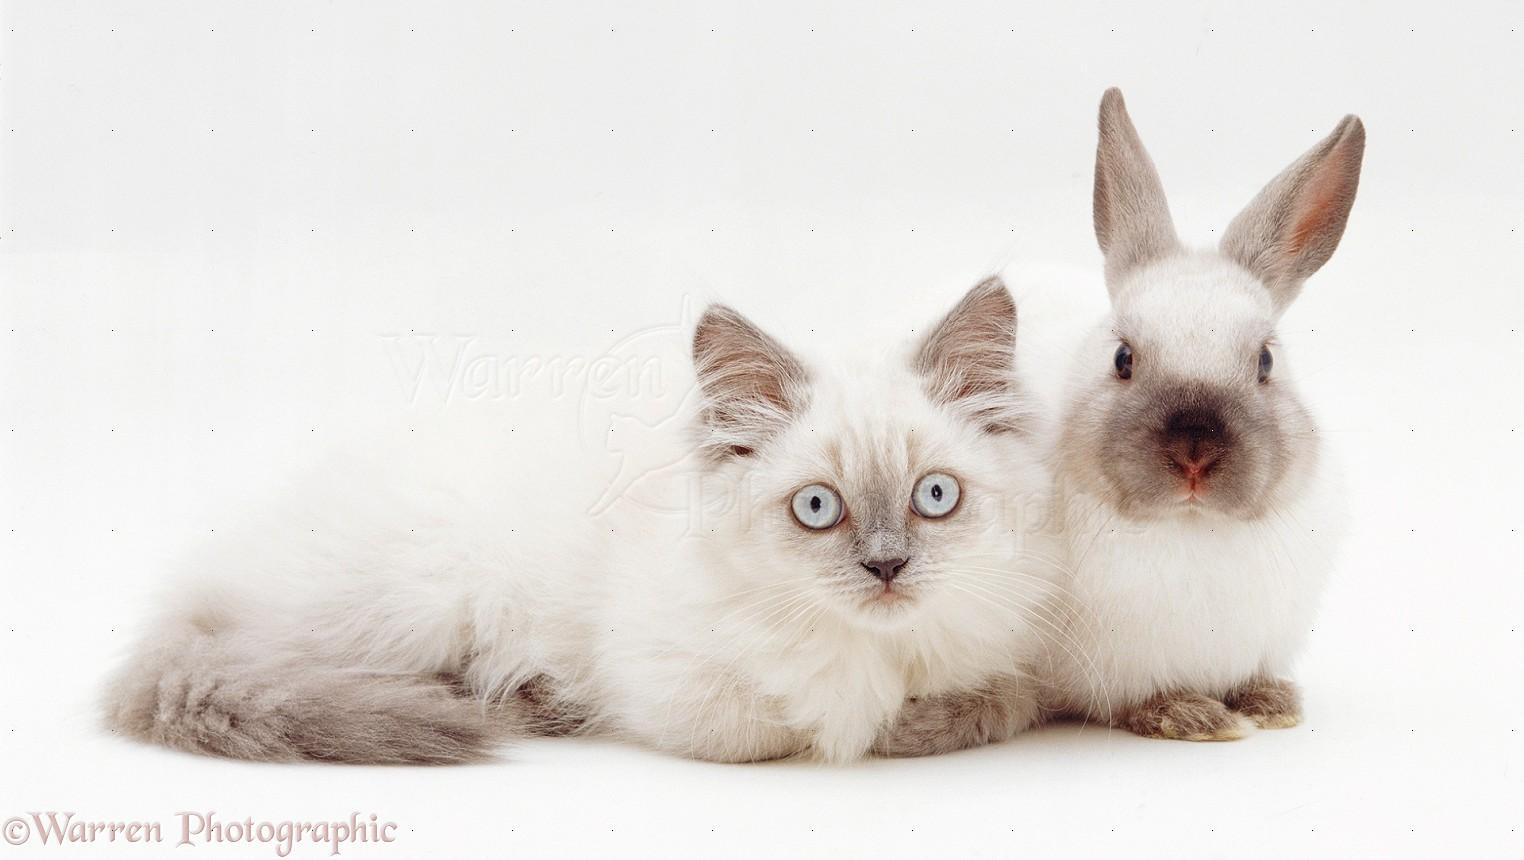 Pets Colourpoint kitten with colourpoint Dwarf rabbit photo WP